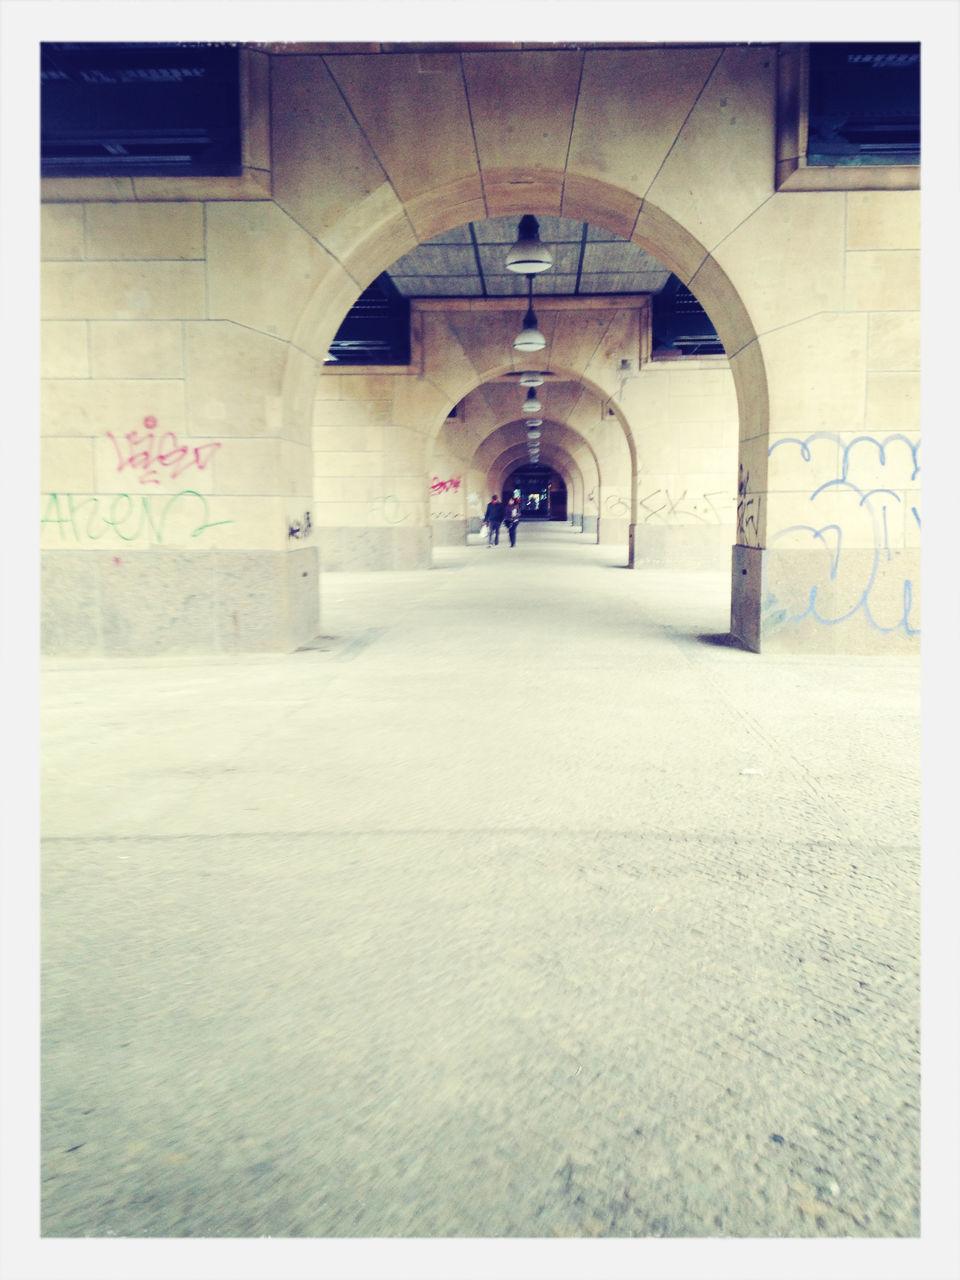 People walking in archway